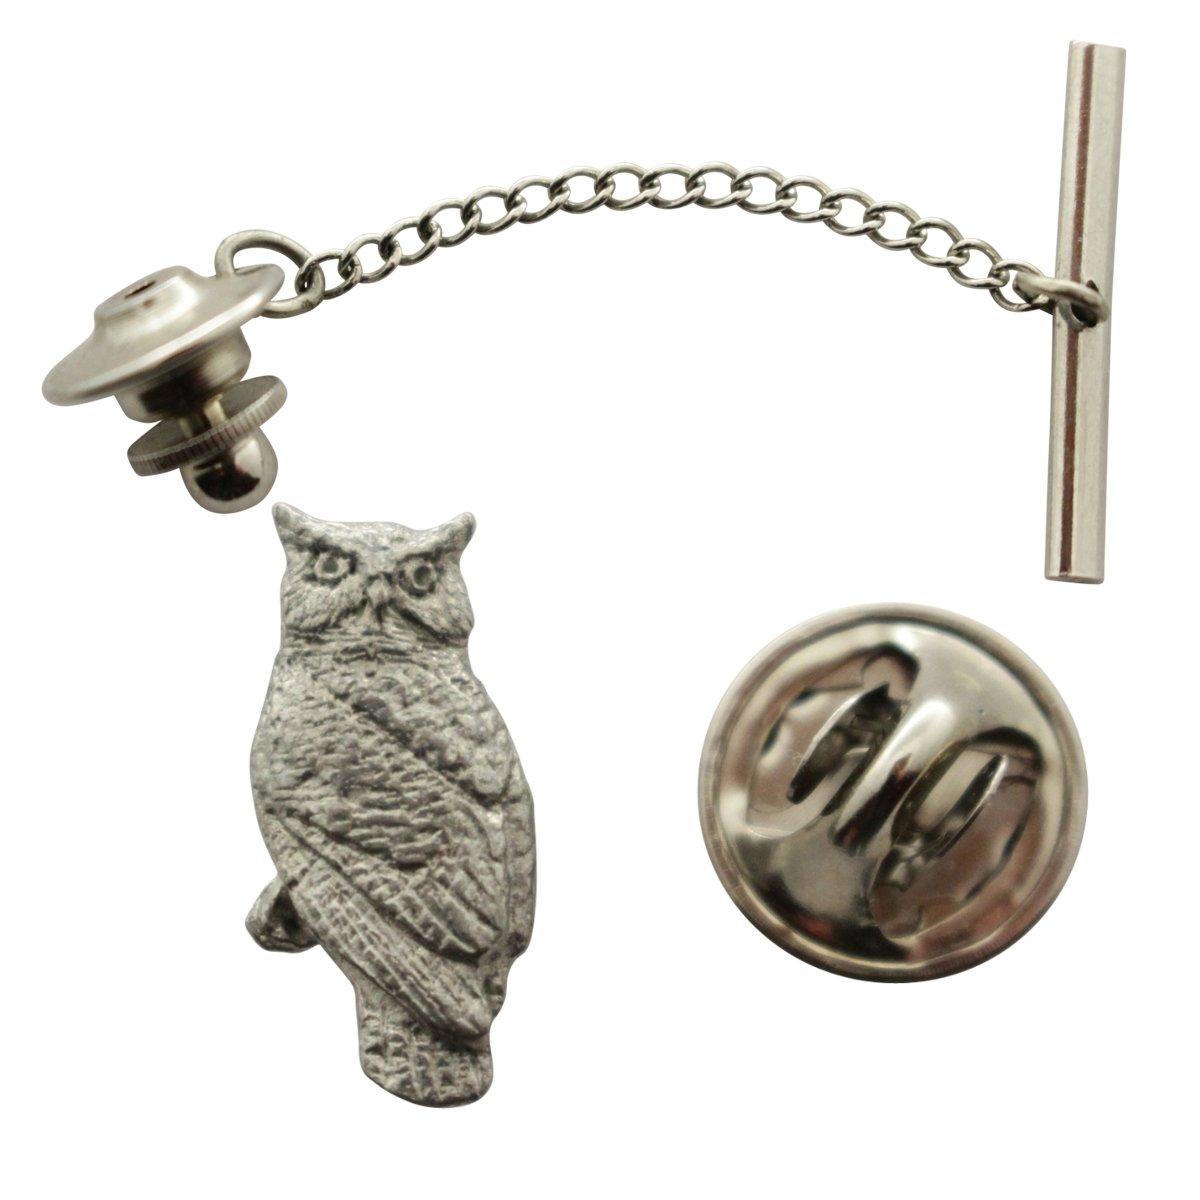 Owl Tie Tack ~ Antiqued Pewter ~ Tie Tack or Pin ~ Sarah's Treats & Treasures